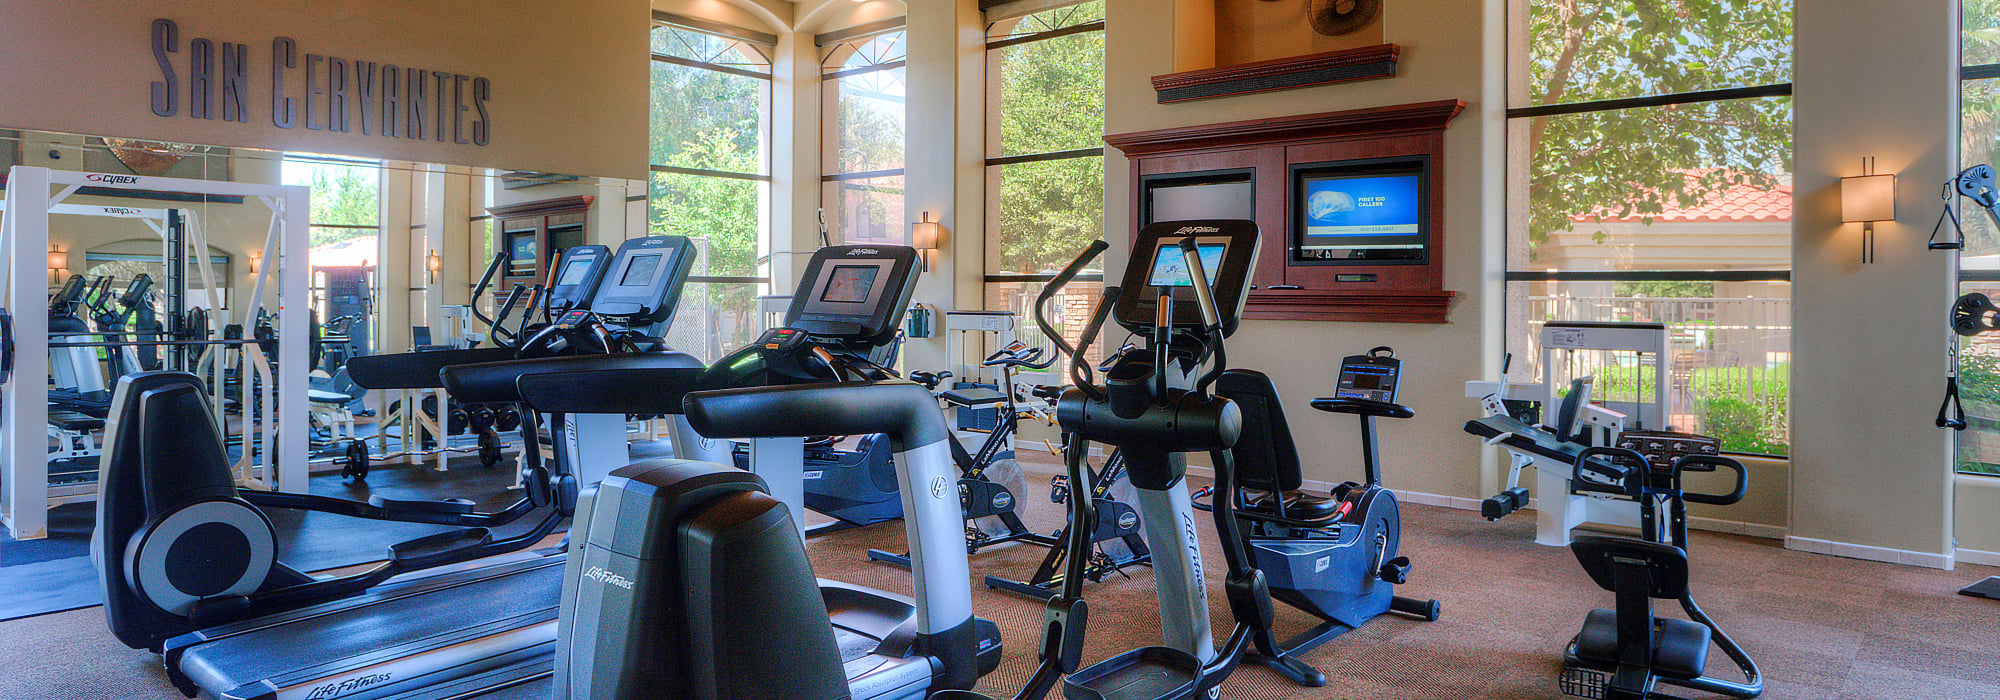 Fitness center at San Cervantes in Chandler, Arizona